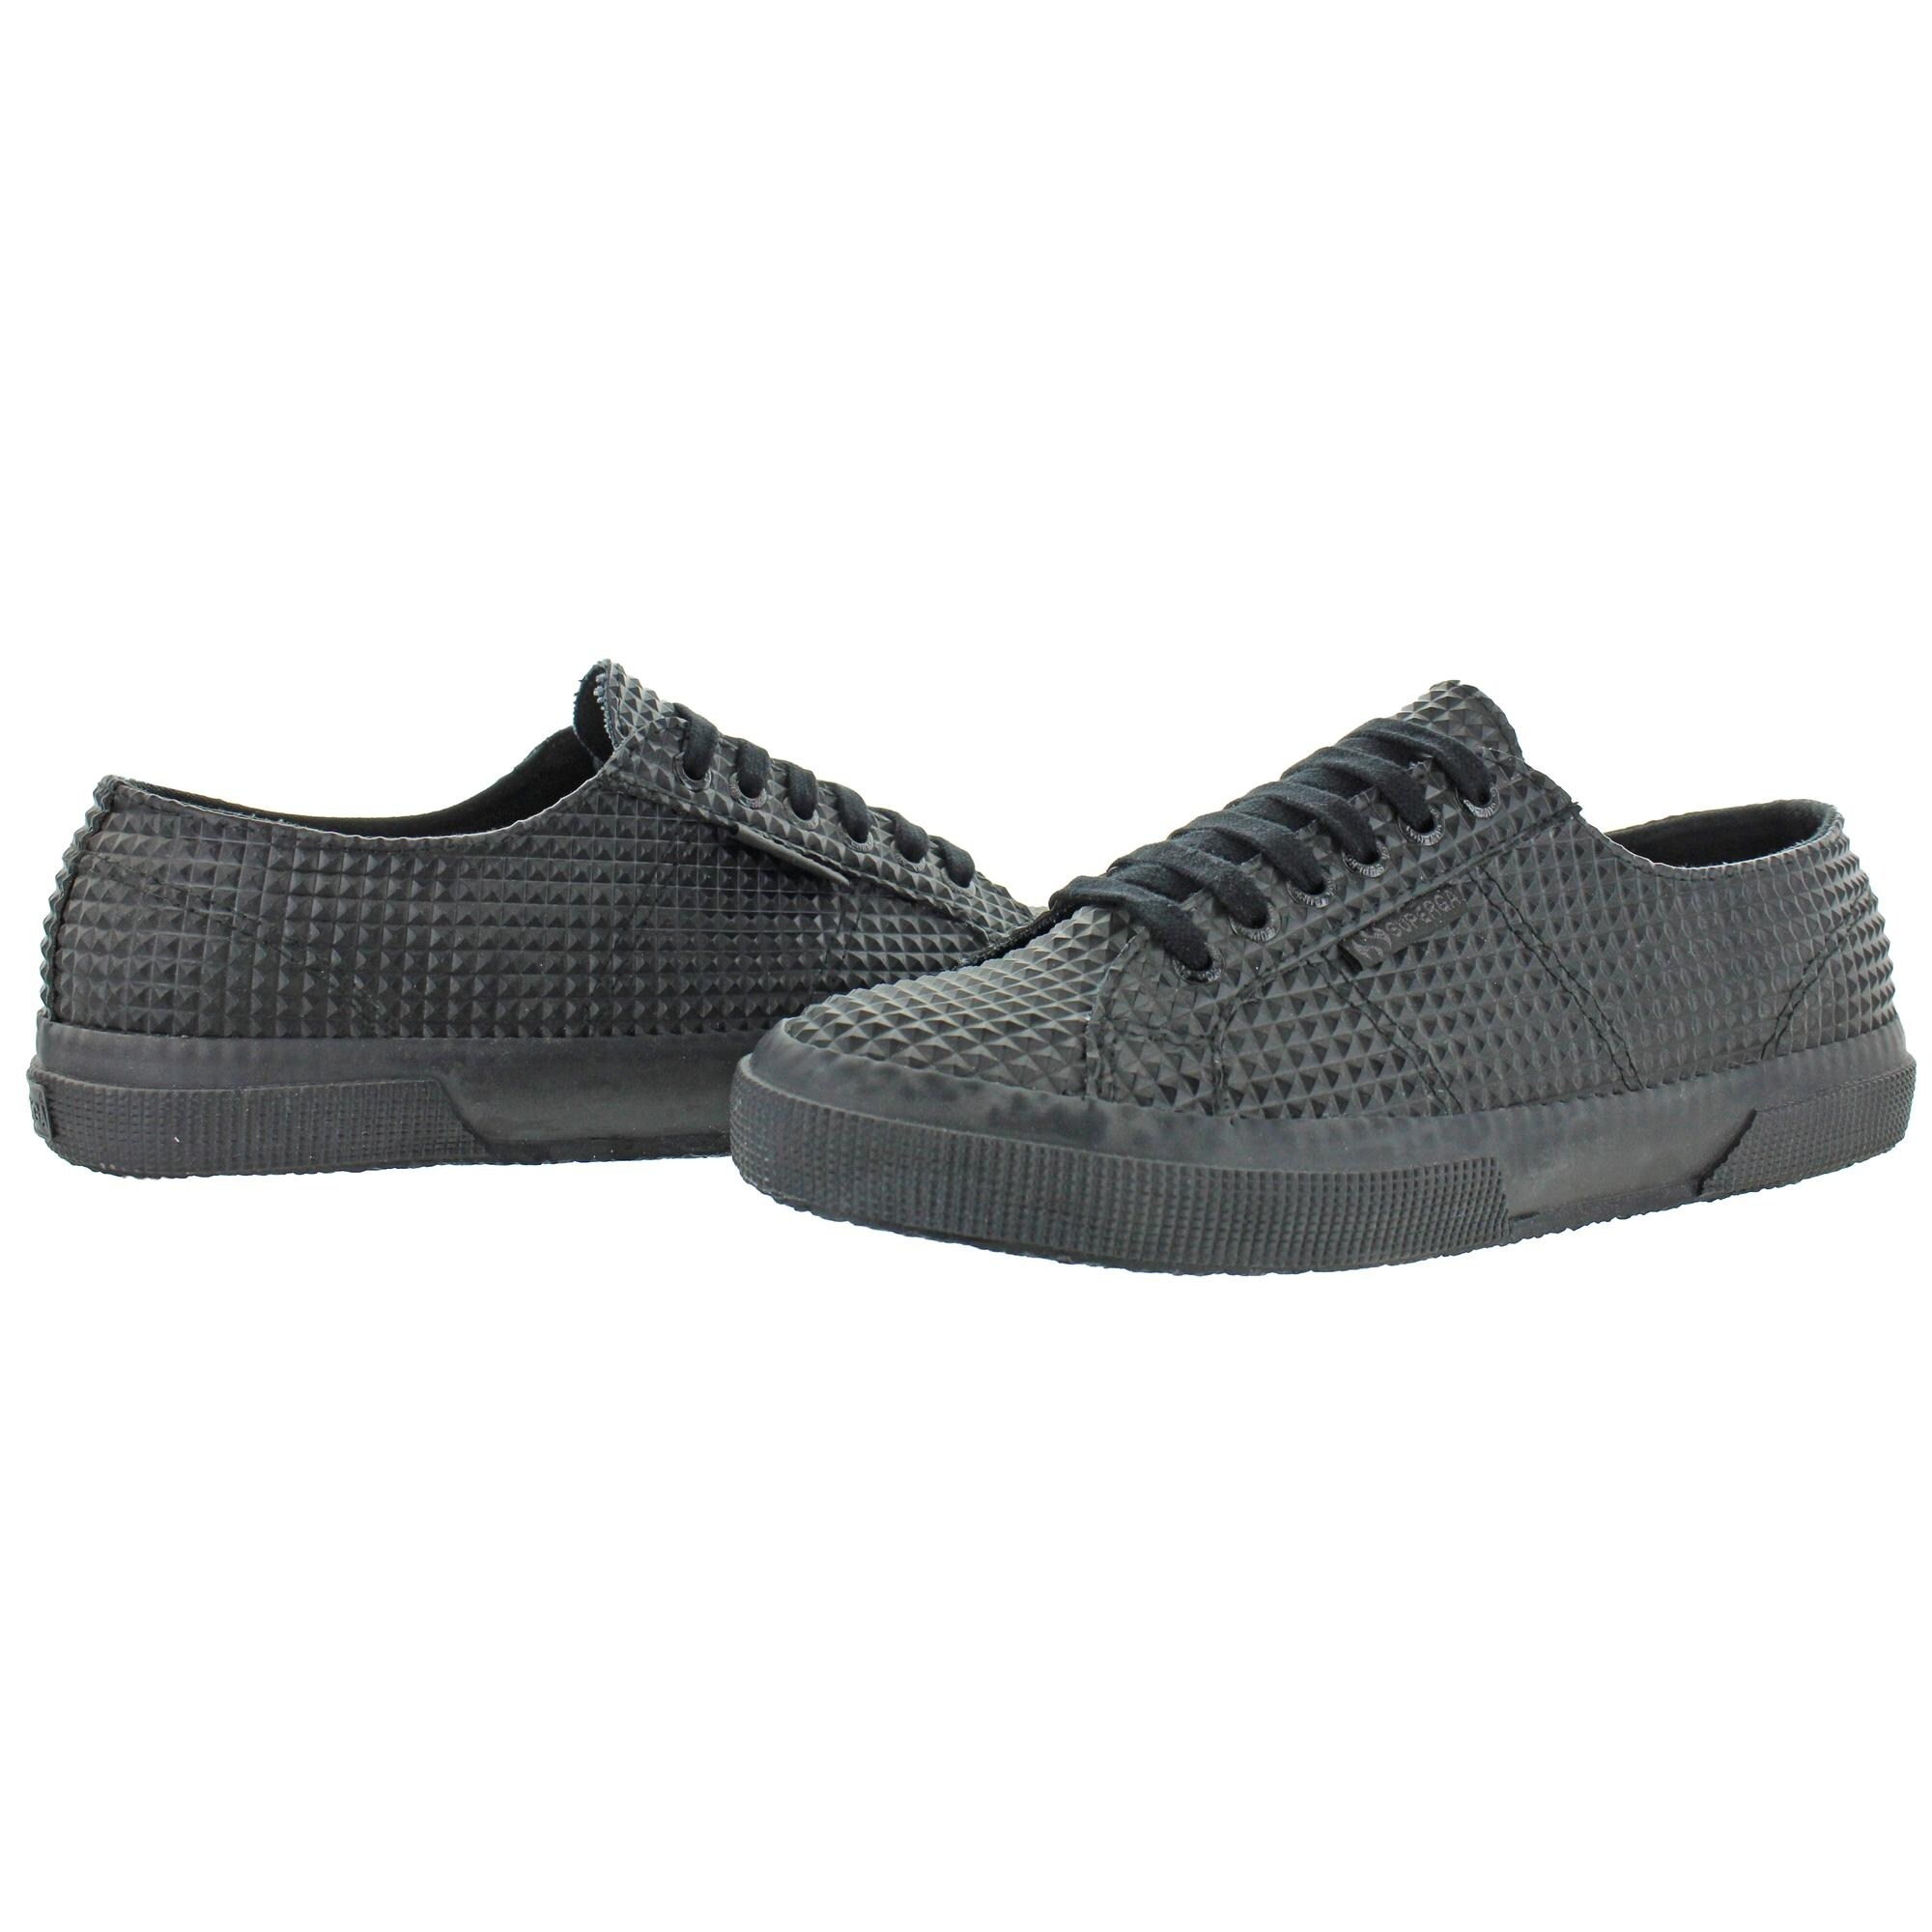 Shop Superga Mens 2750 Sneakers Rubber